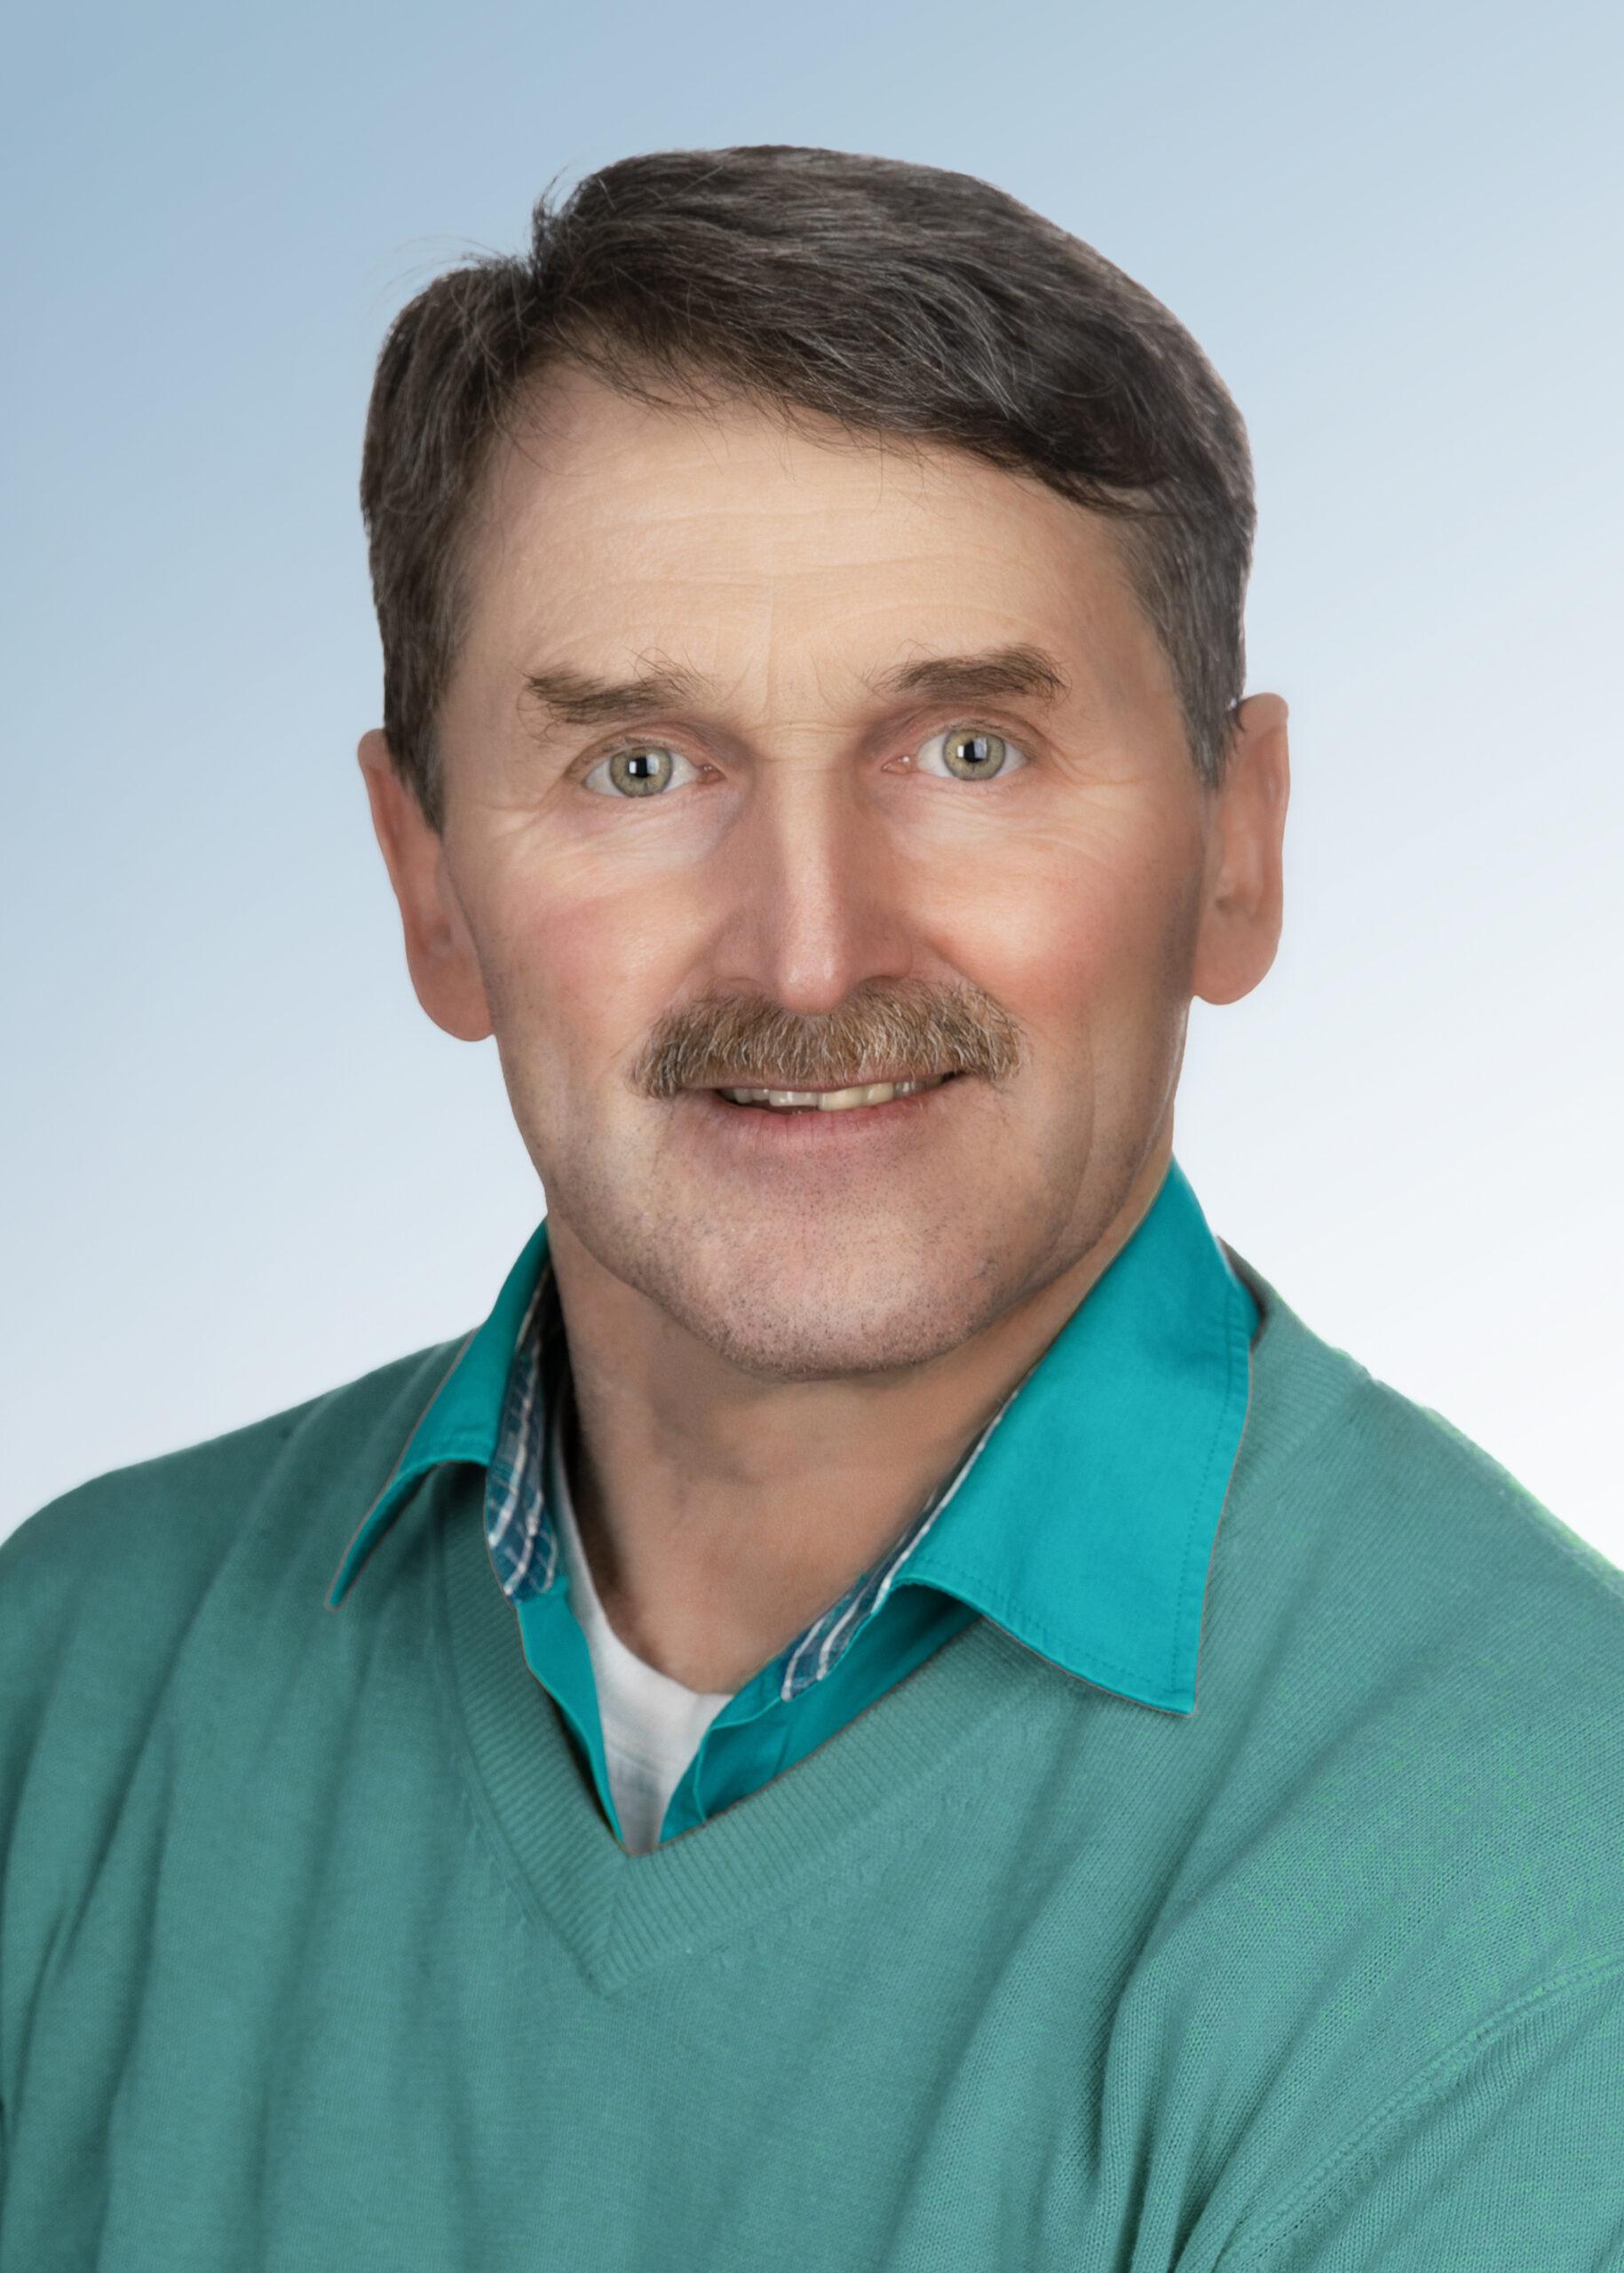 Siegfried Hummel, 3. Bürgermeister des Markt Geiselwind